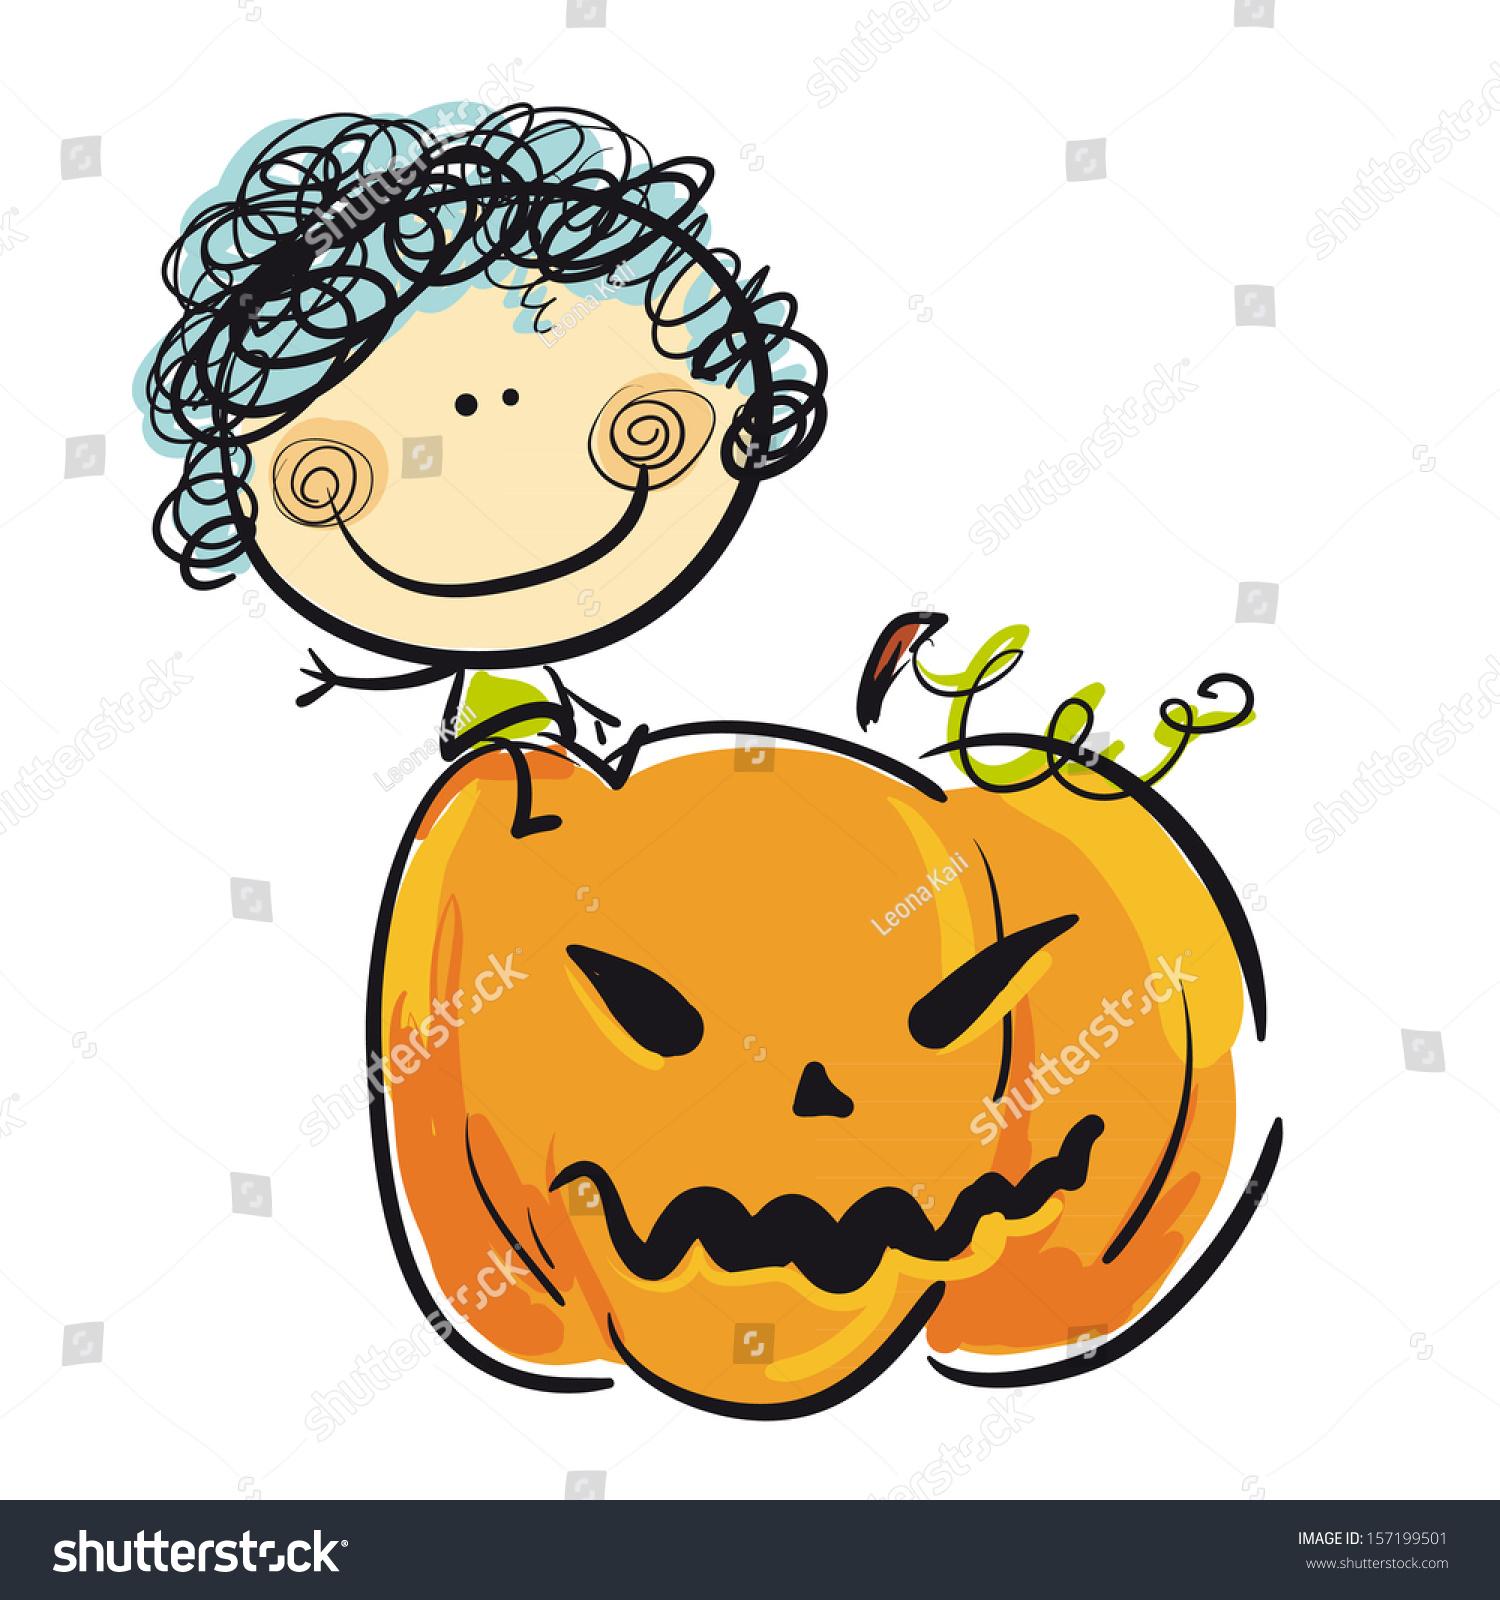 Vector Stock - Big pumpkin. Clipart Illustration gg58265596 - GoGraph